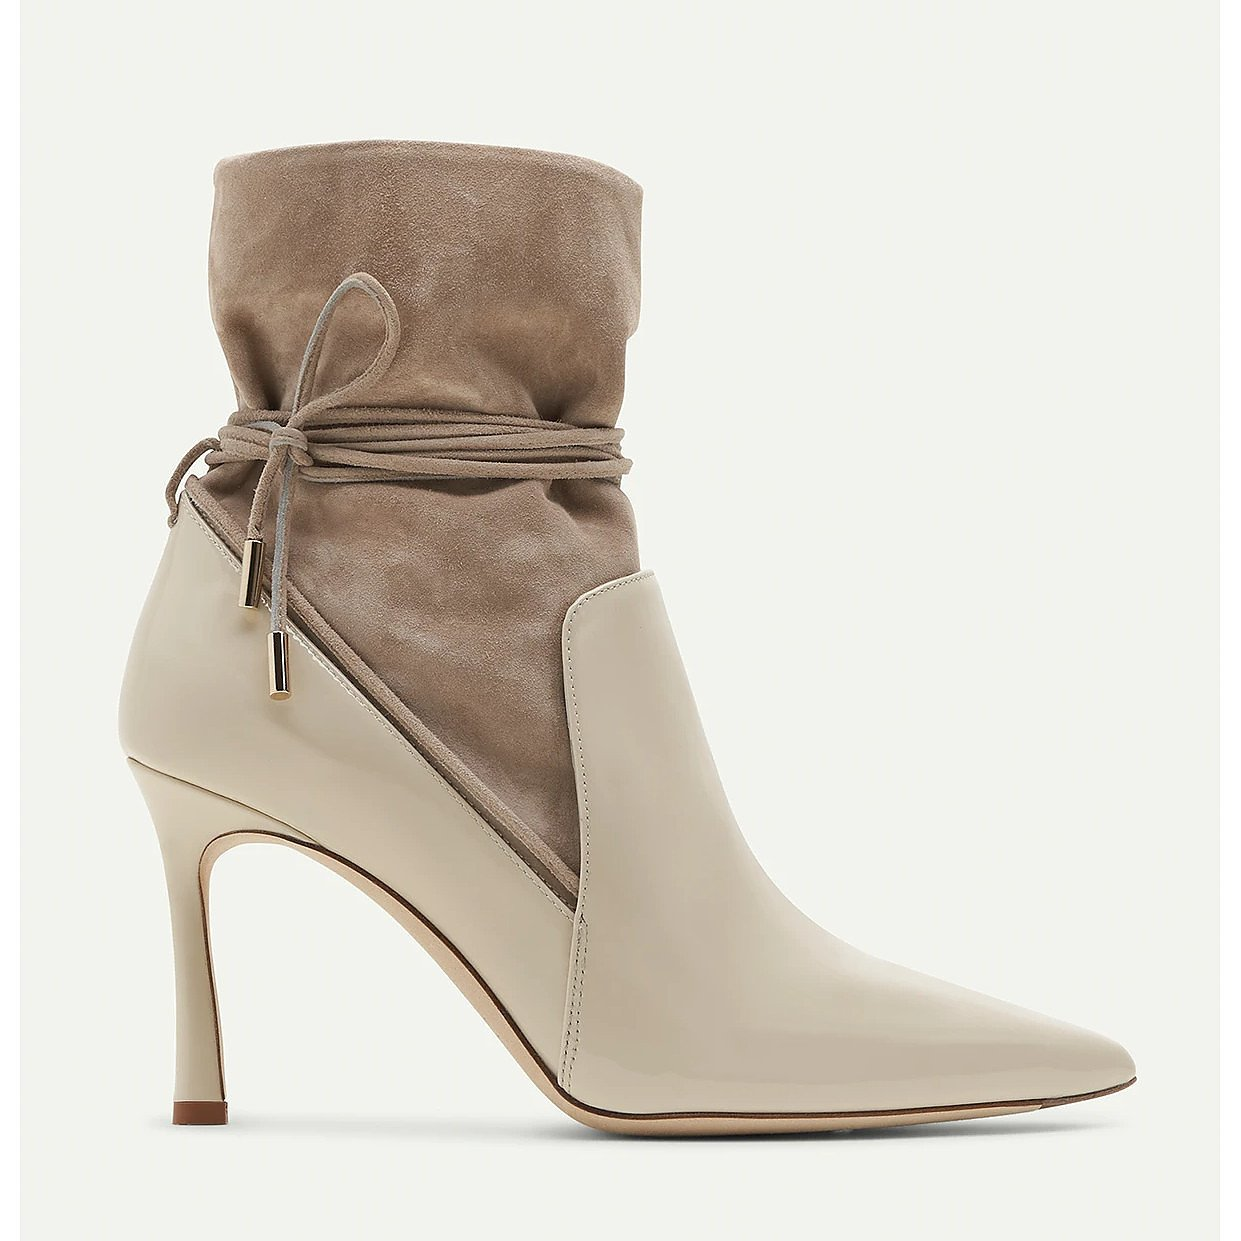 Ghazal Leyth Boots